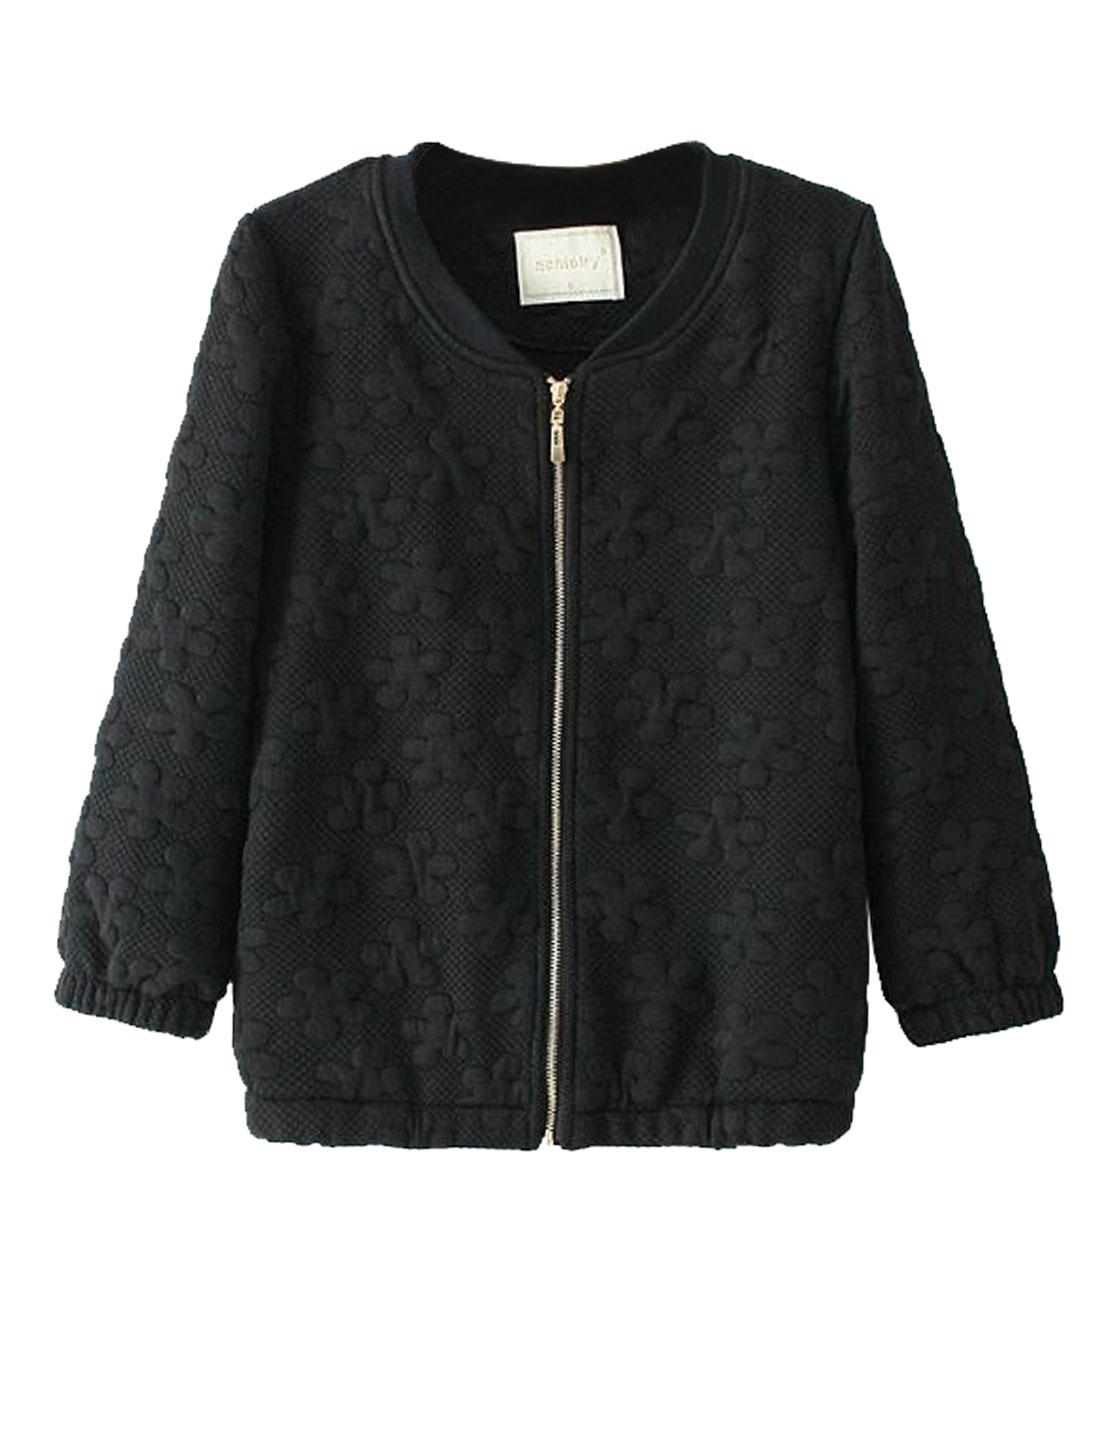 Ladies Stand Collar Three Quarter Sleeves Leisure Jacket Black S